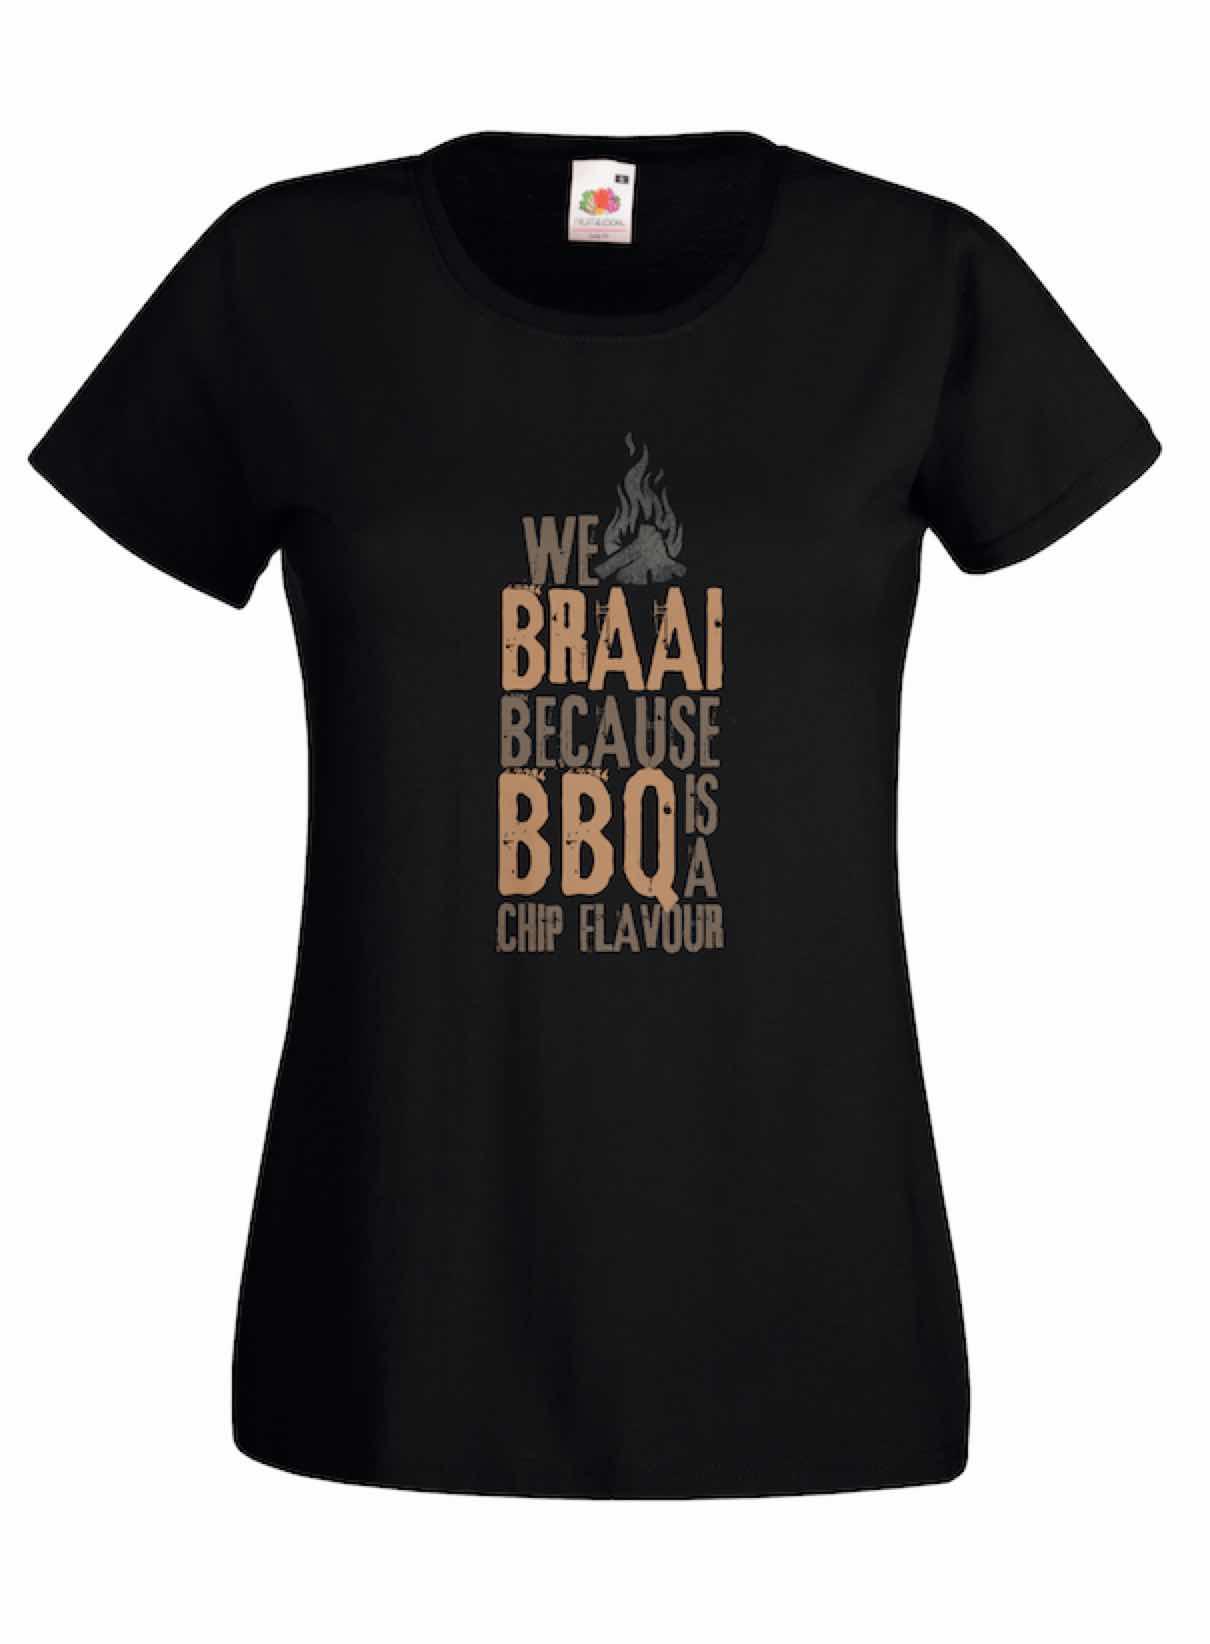 We Braai design for t-shirt, hoodie & sweatshirt